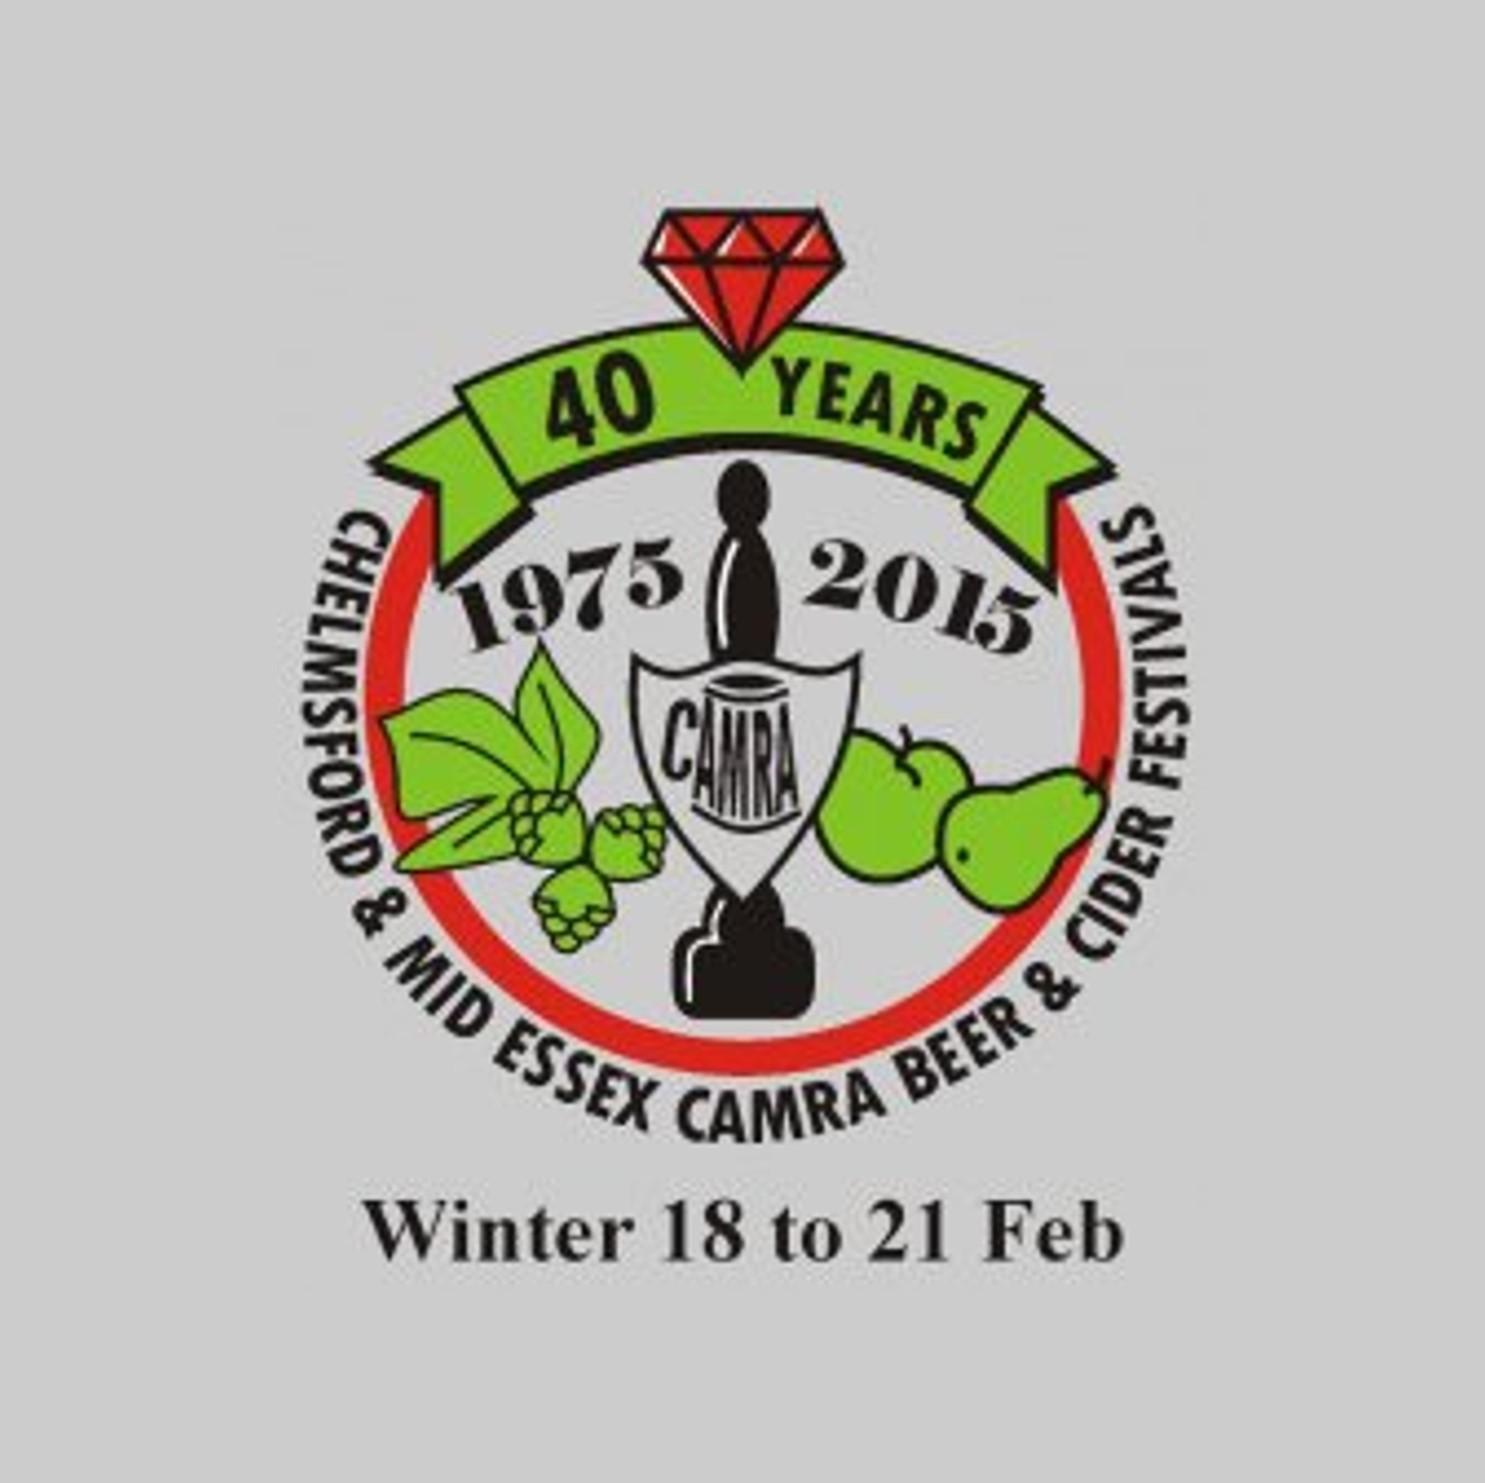 Winter Festival 2015